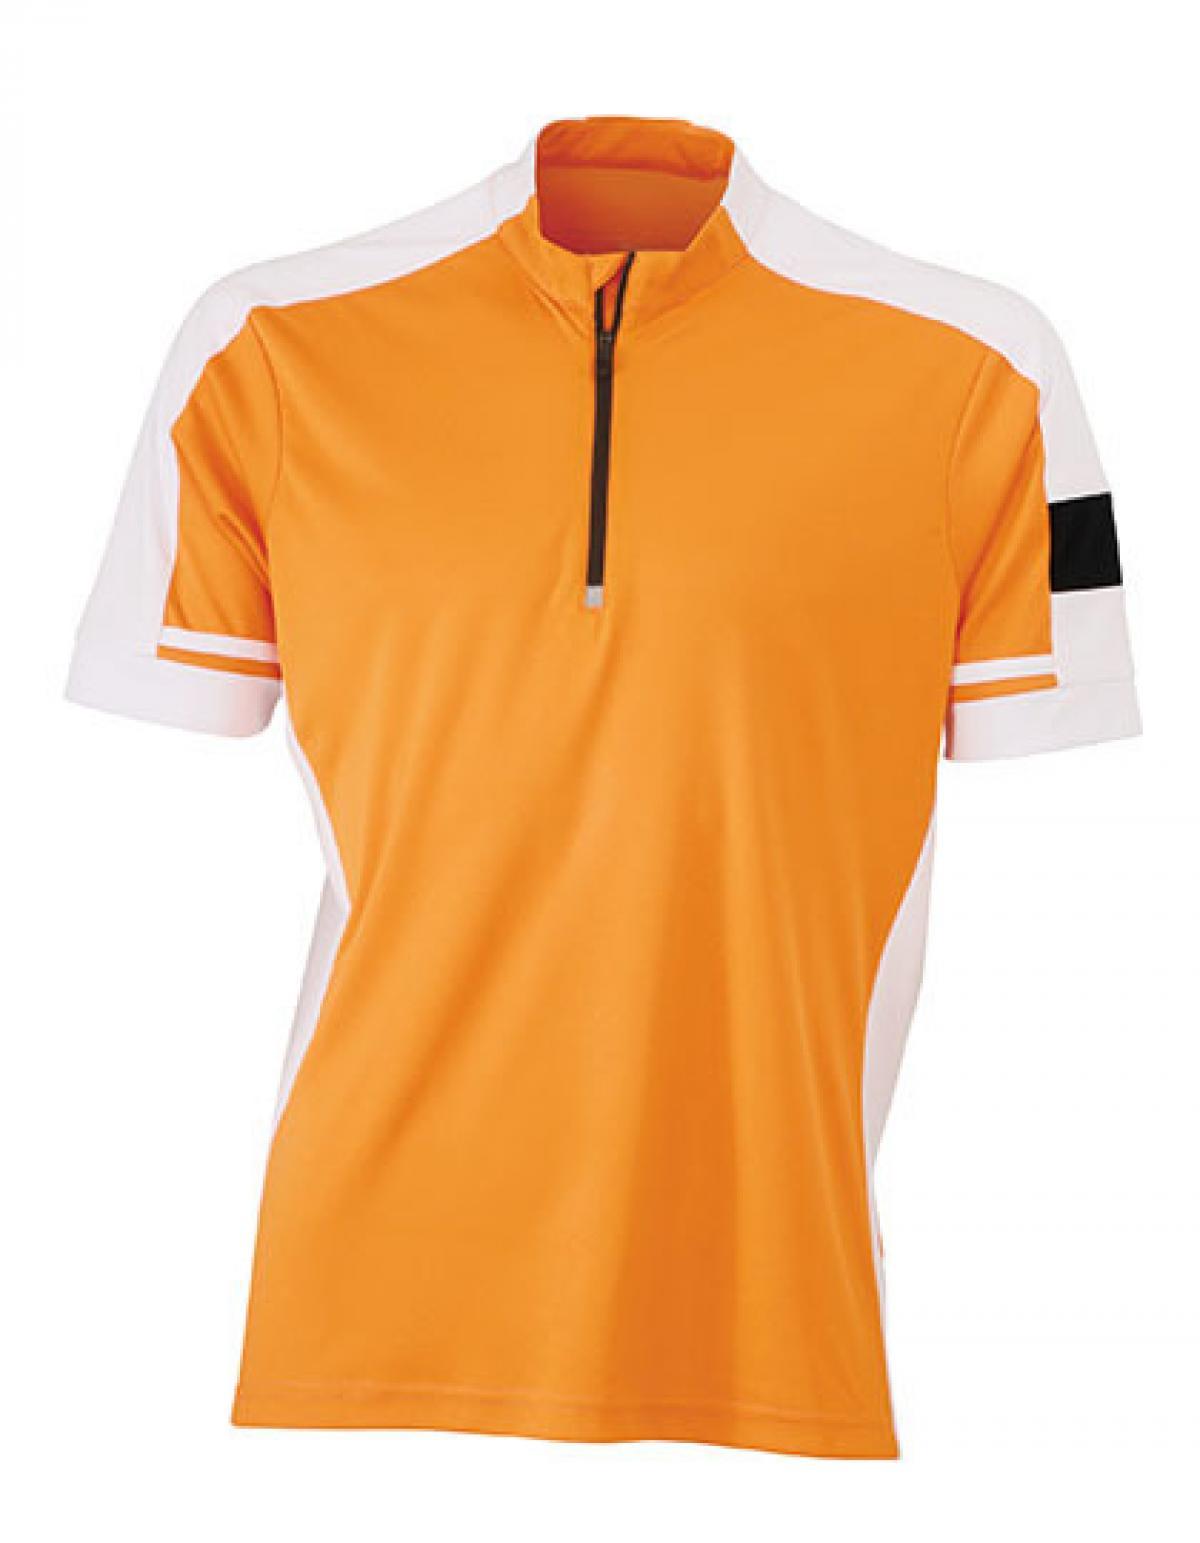 Men s bike sport t shirt half zip cooldry rexlander s for Mens sport t shirts